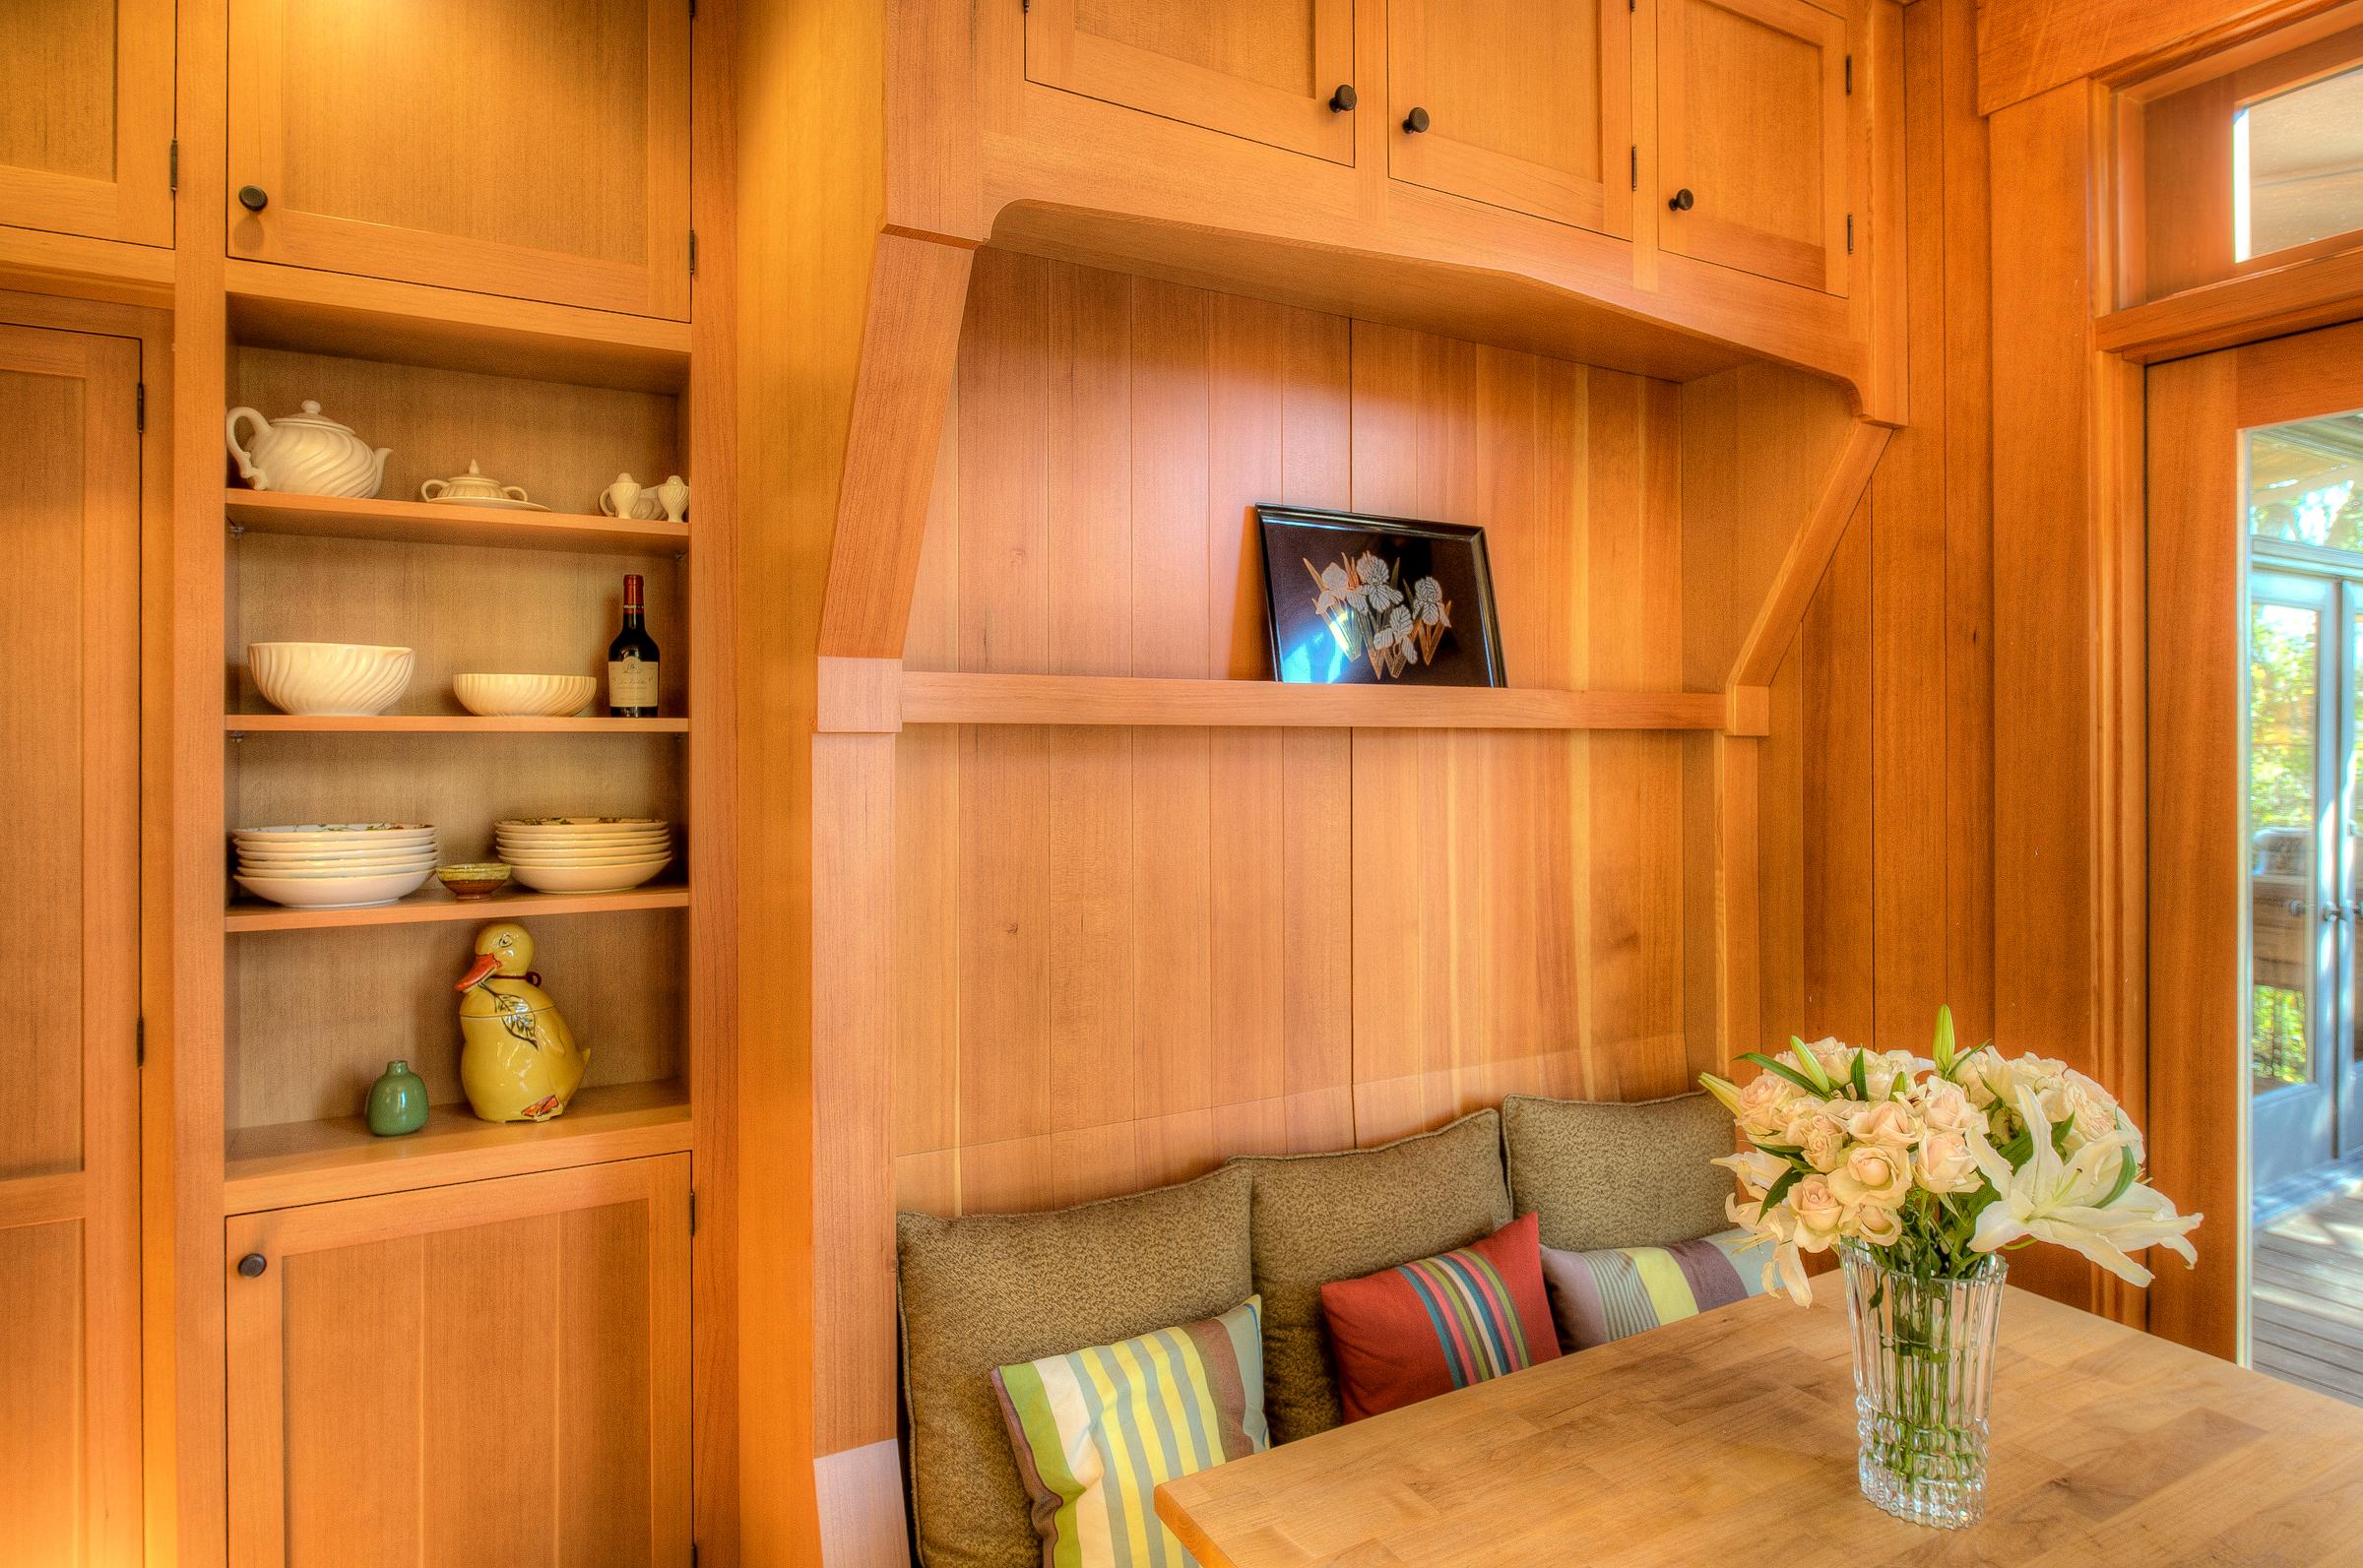 Kitchen_Table+Cabinets_horizontal.jpg